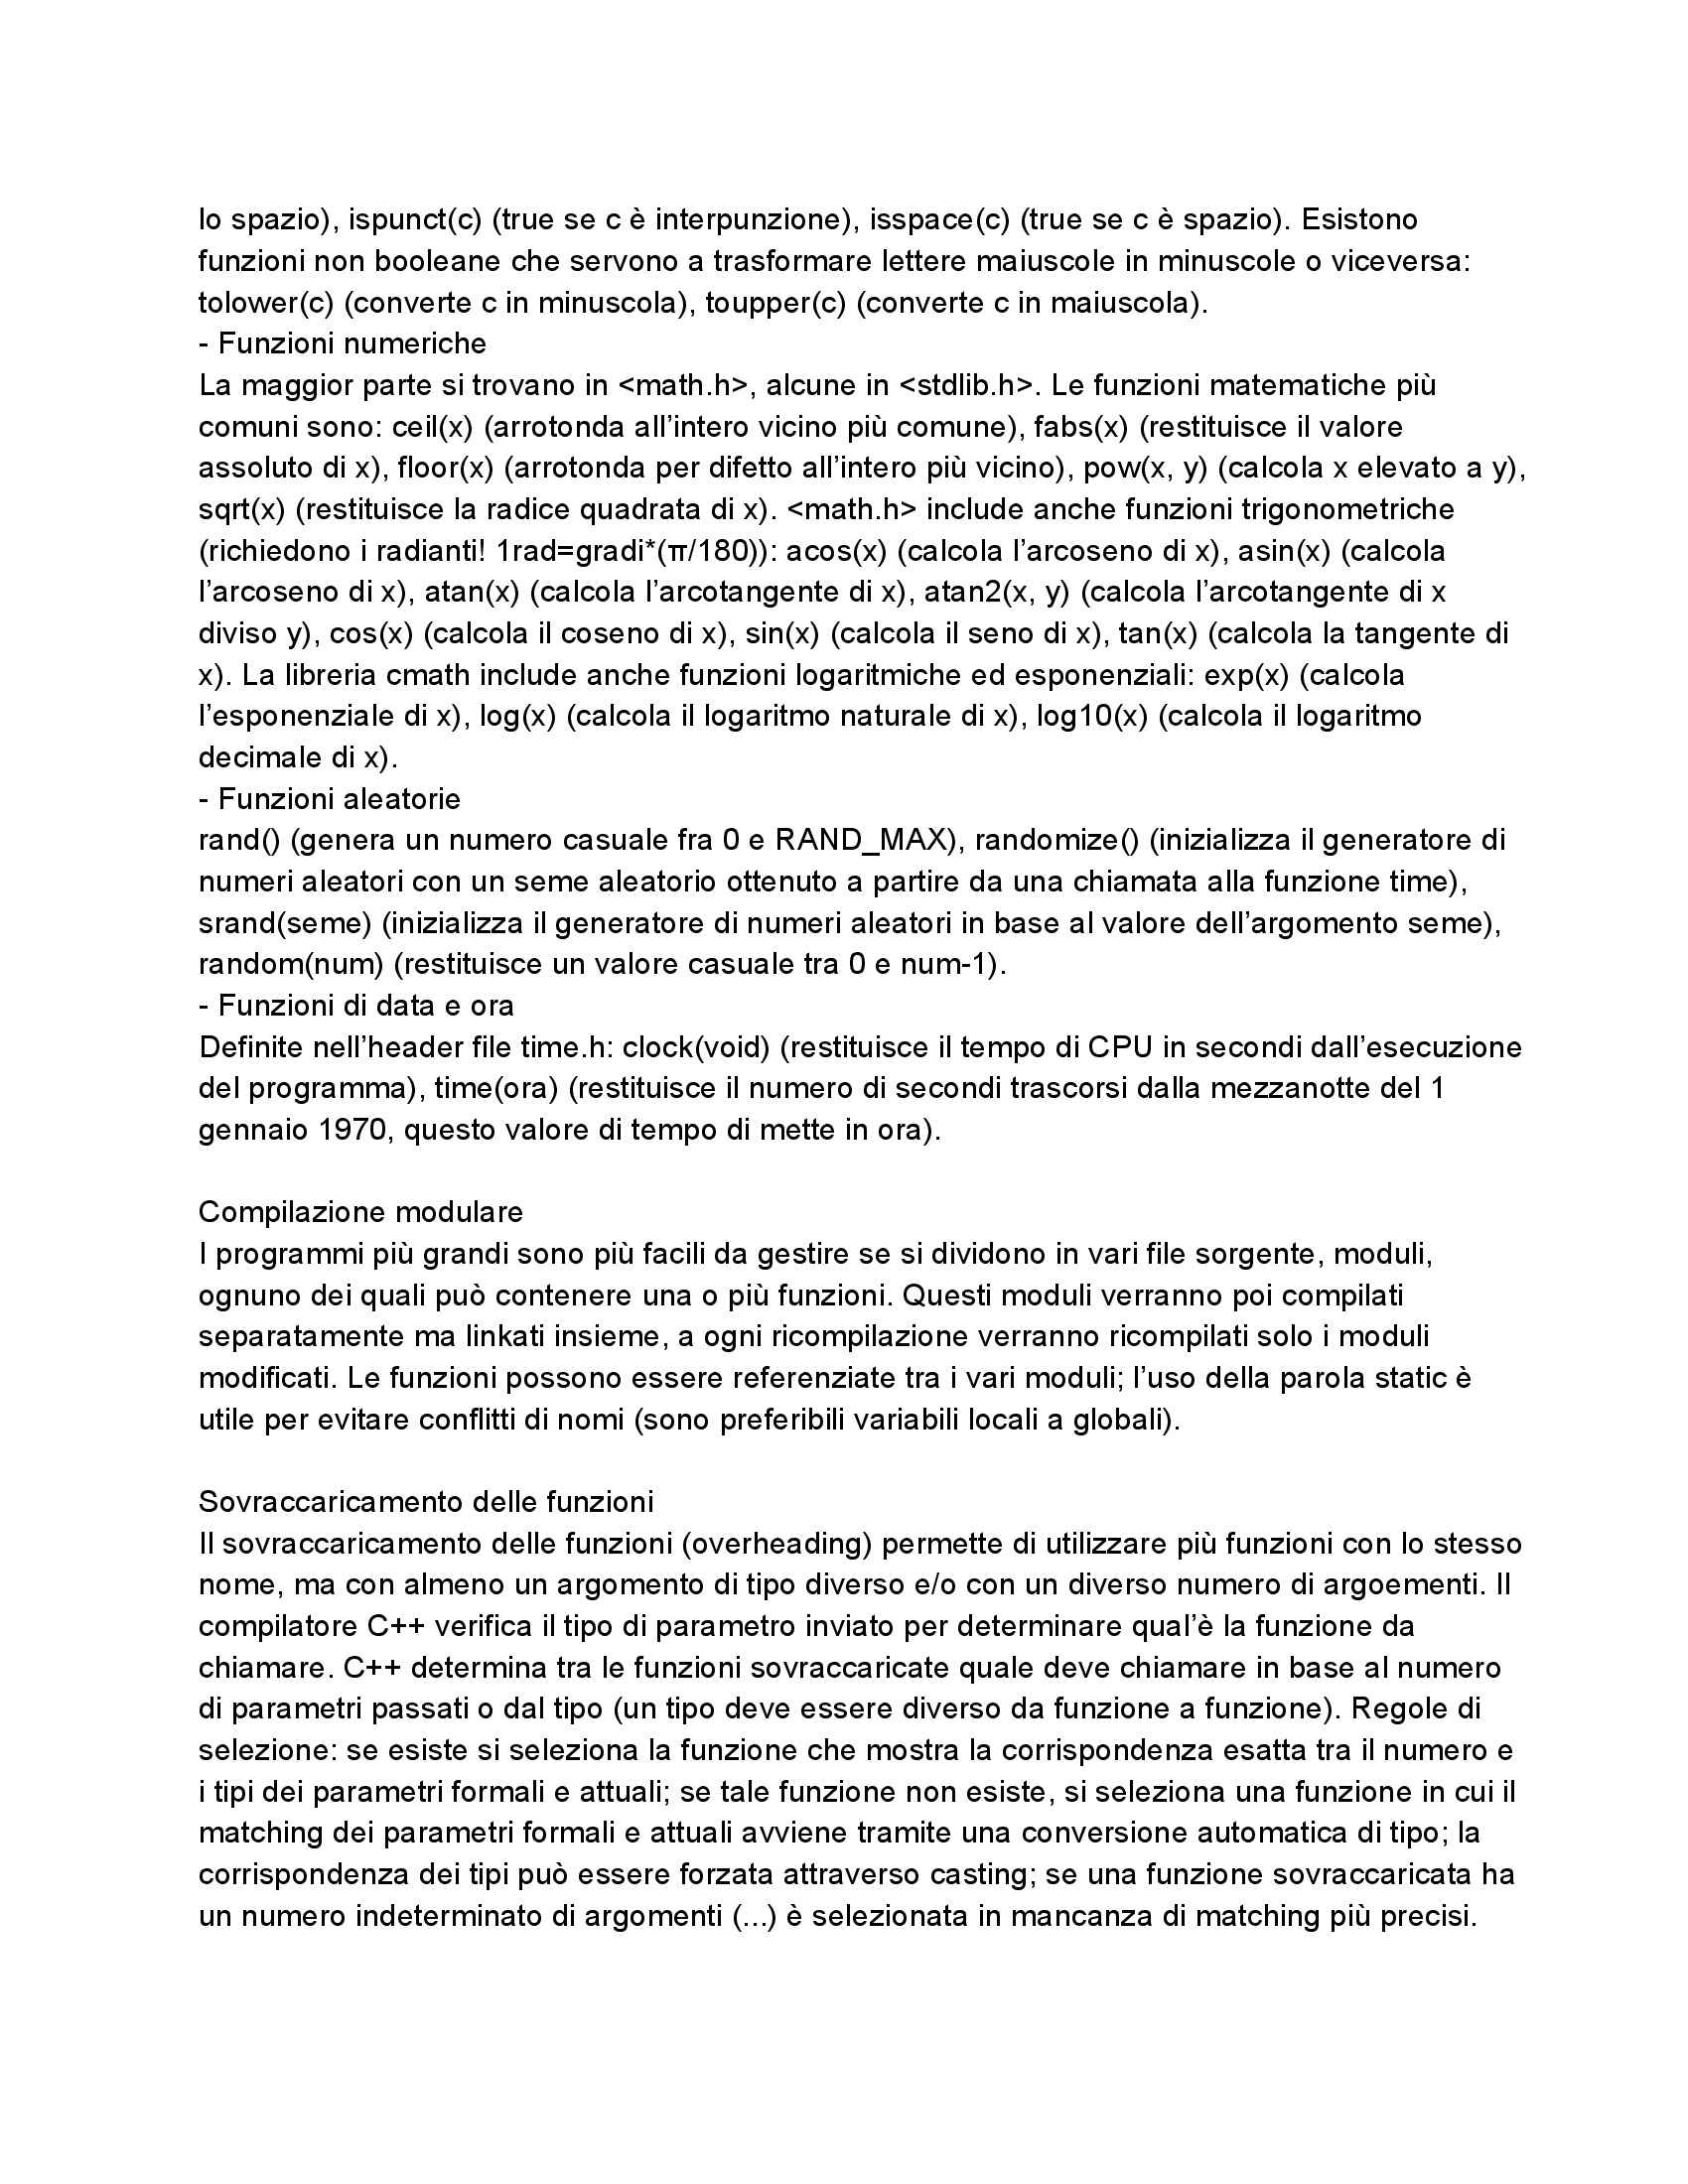 Riassunto esame Fondamenti di Informatica: Manuale di C/C++, prof. Dragoni Pag. 16